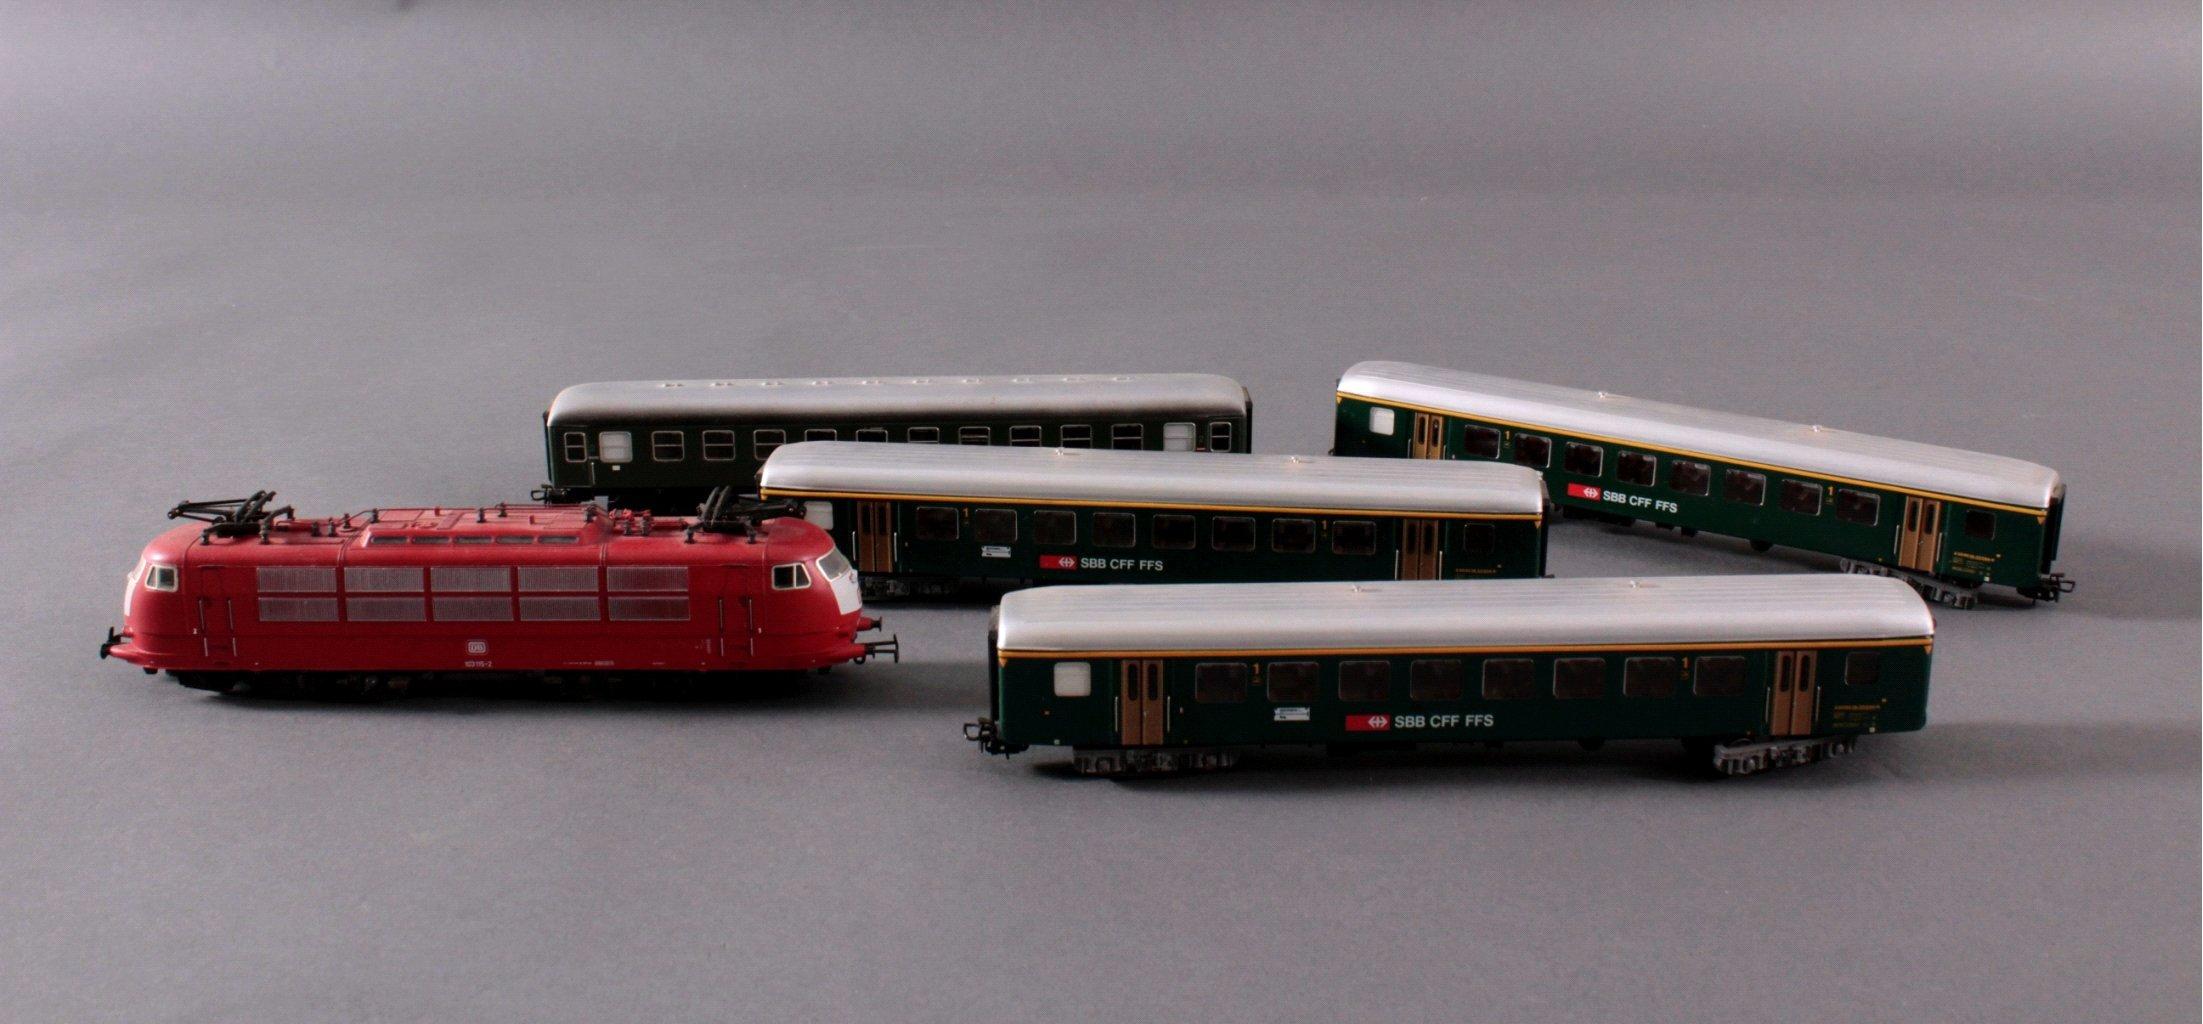 Märklin H0 3357 E-Lok Baureihe 103 115-2 DB in rot mit